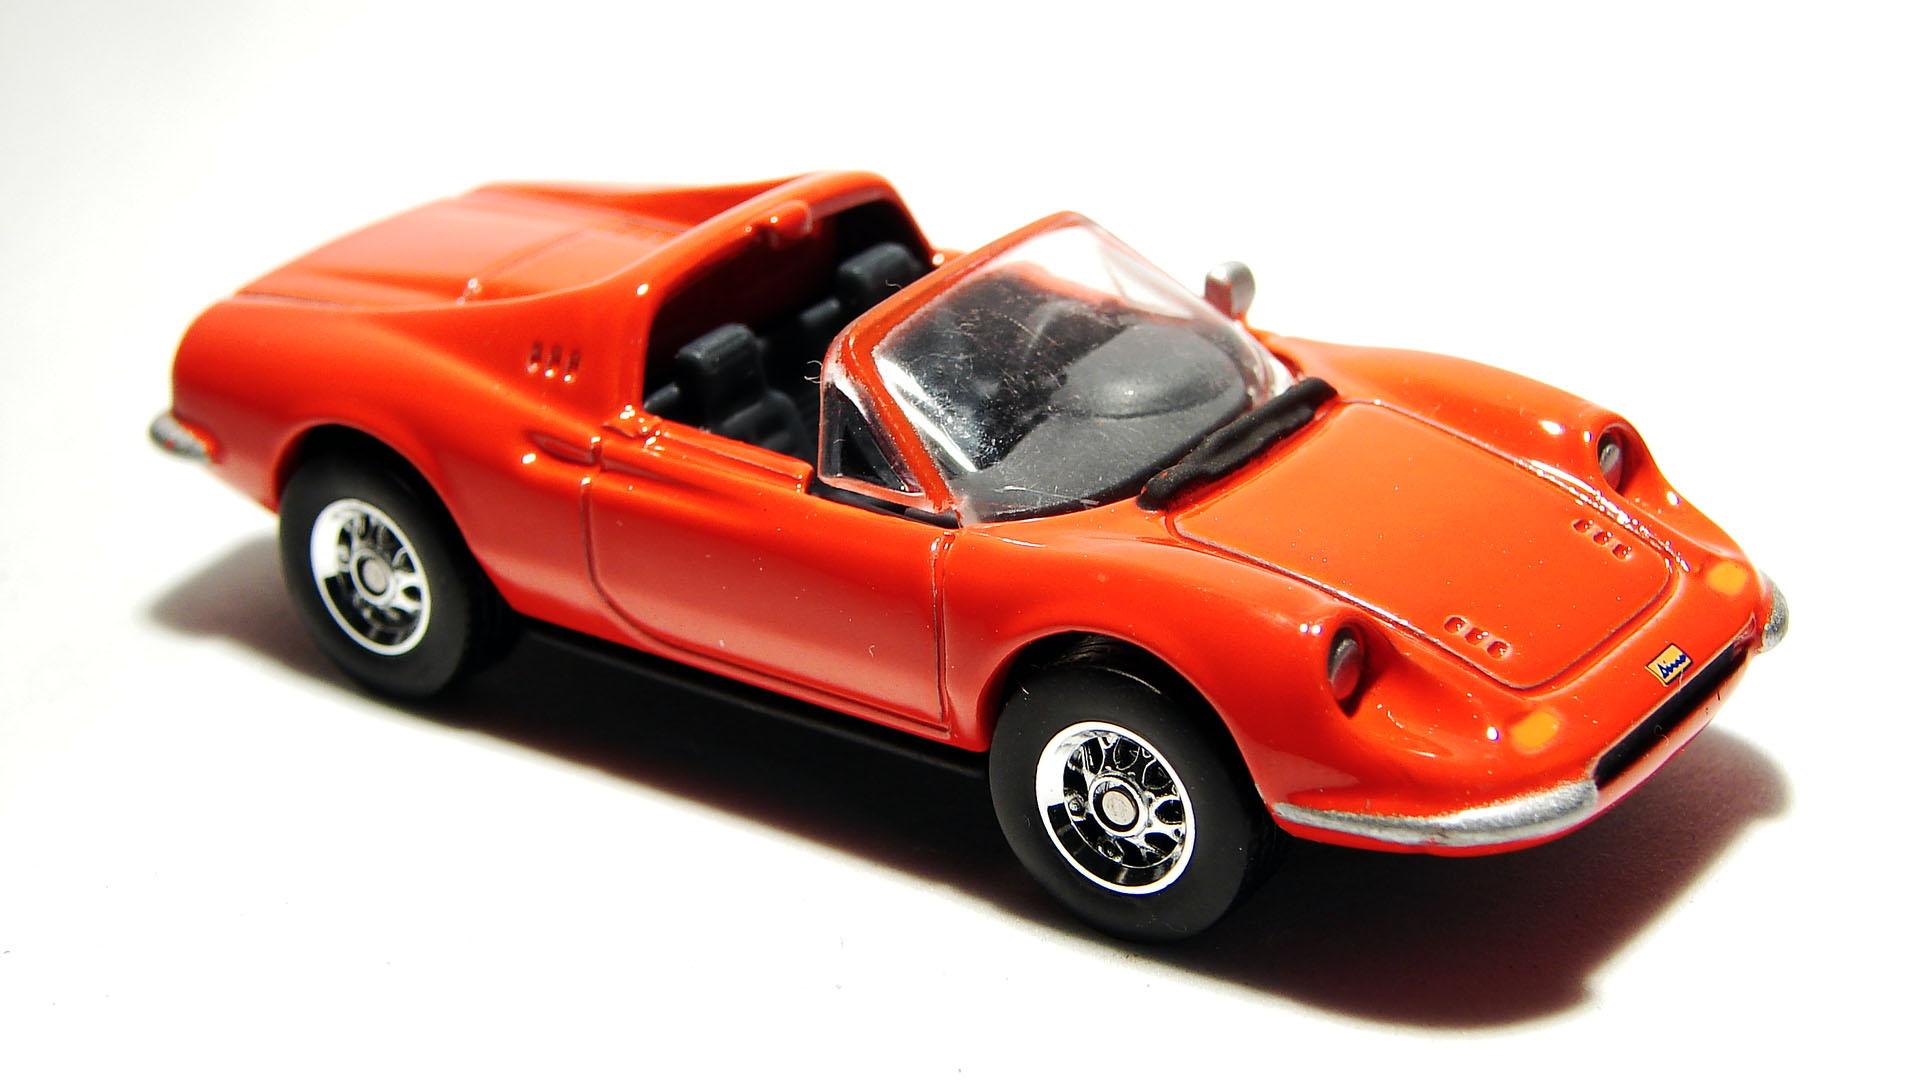 Ferrari Dino 246 Gt Hot Wheels Wiki Fandom Powered By